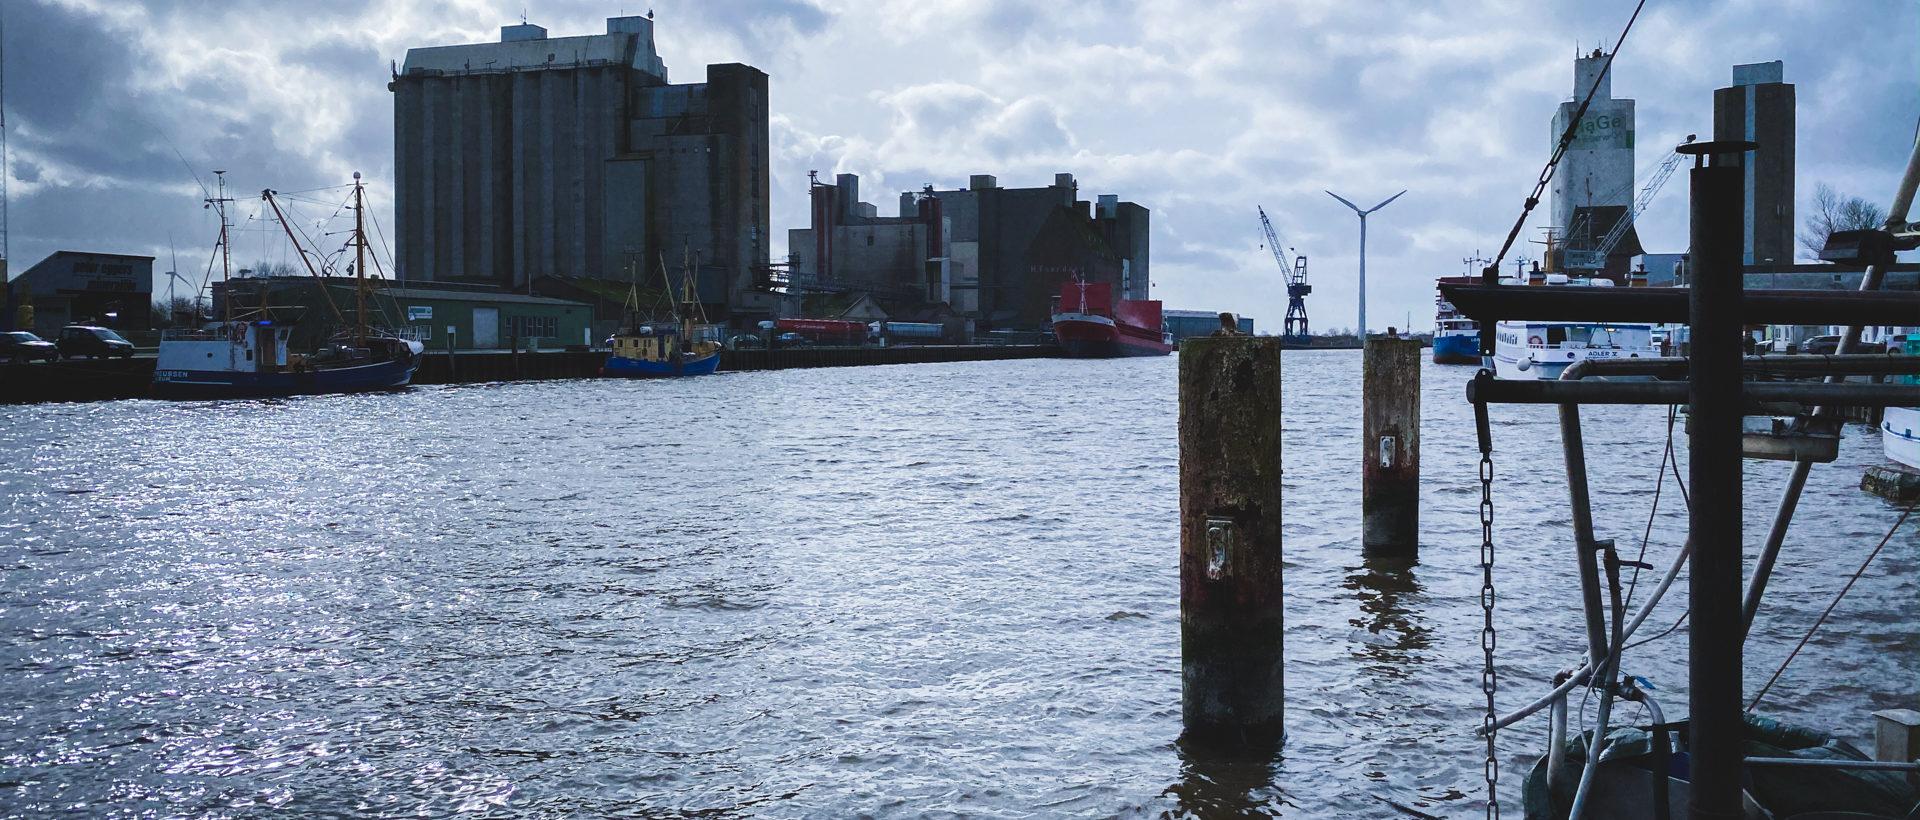 Husumer Hafen